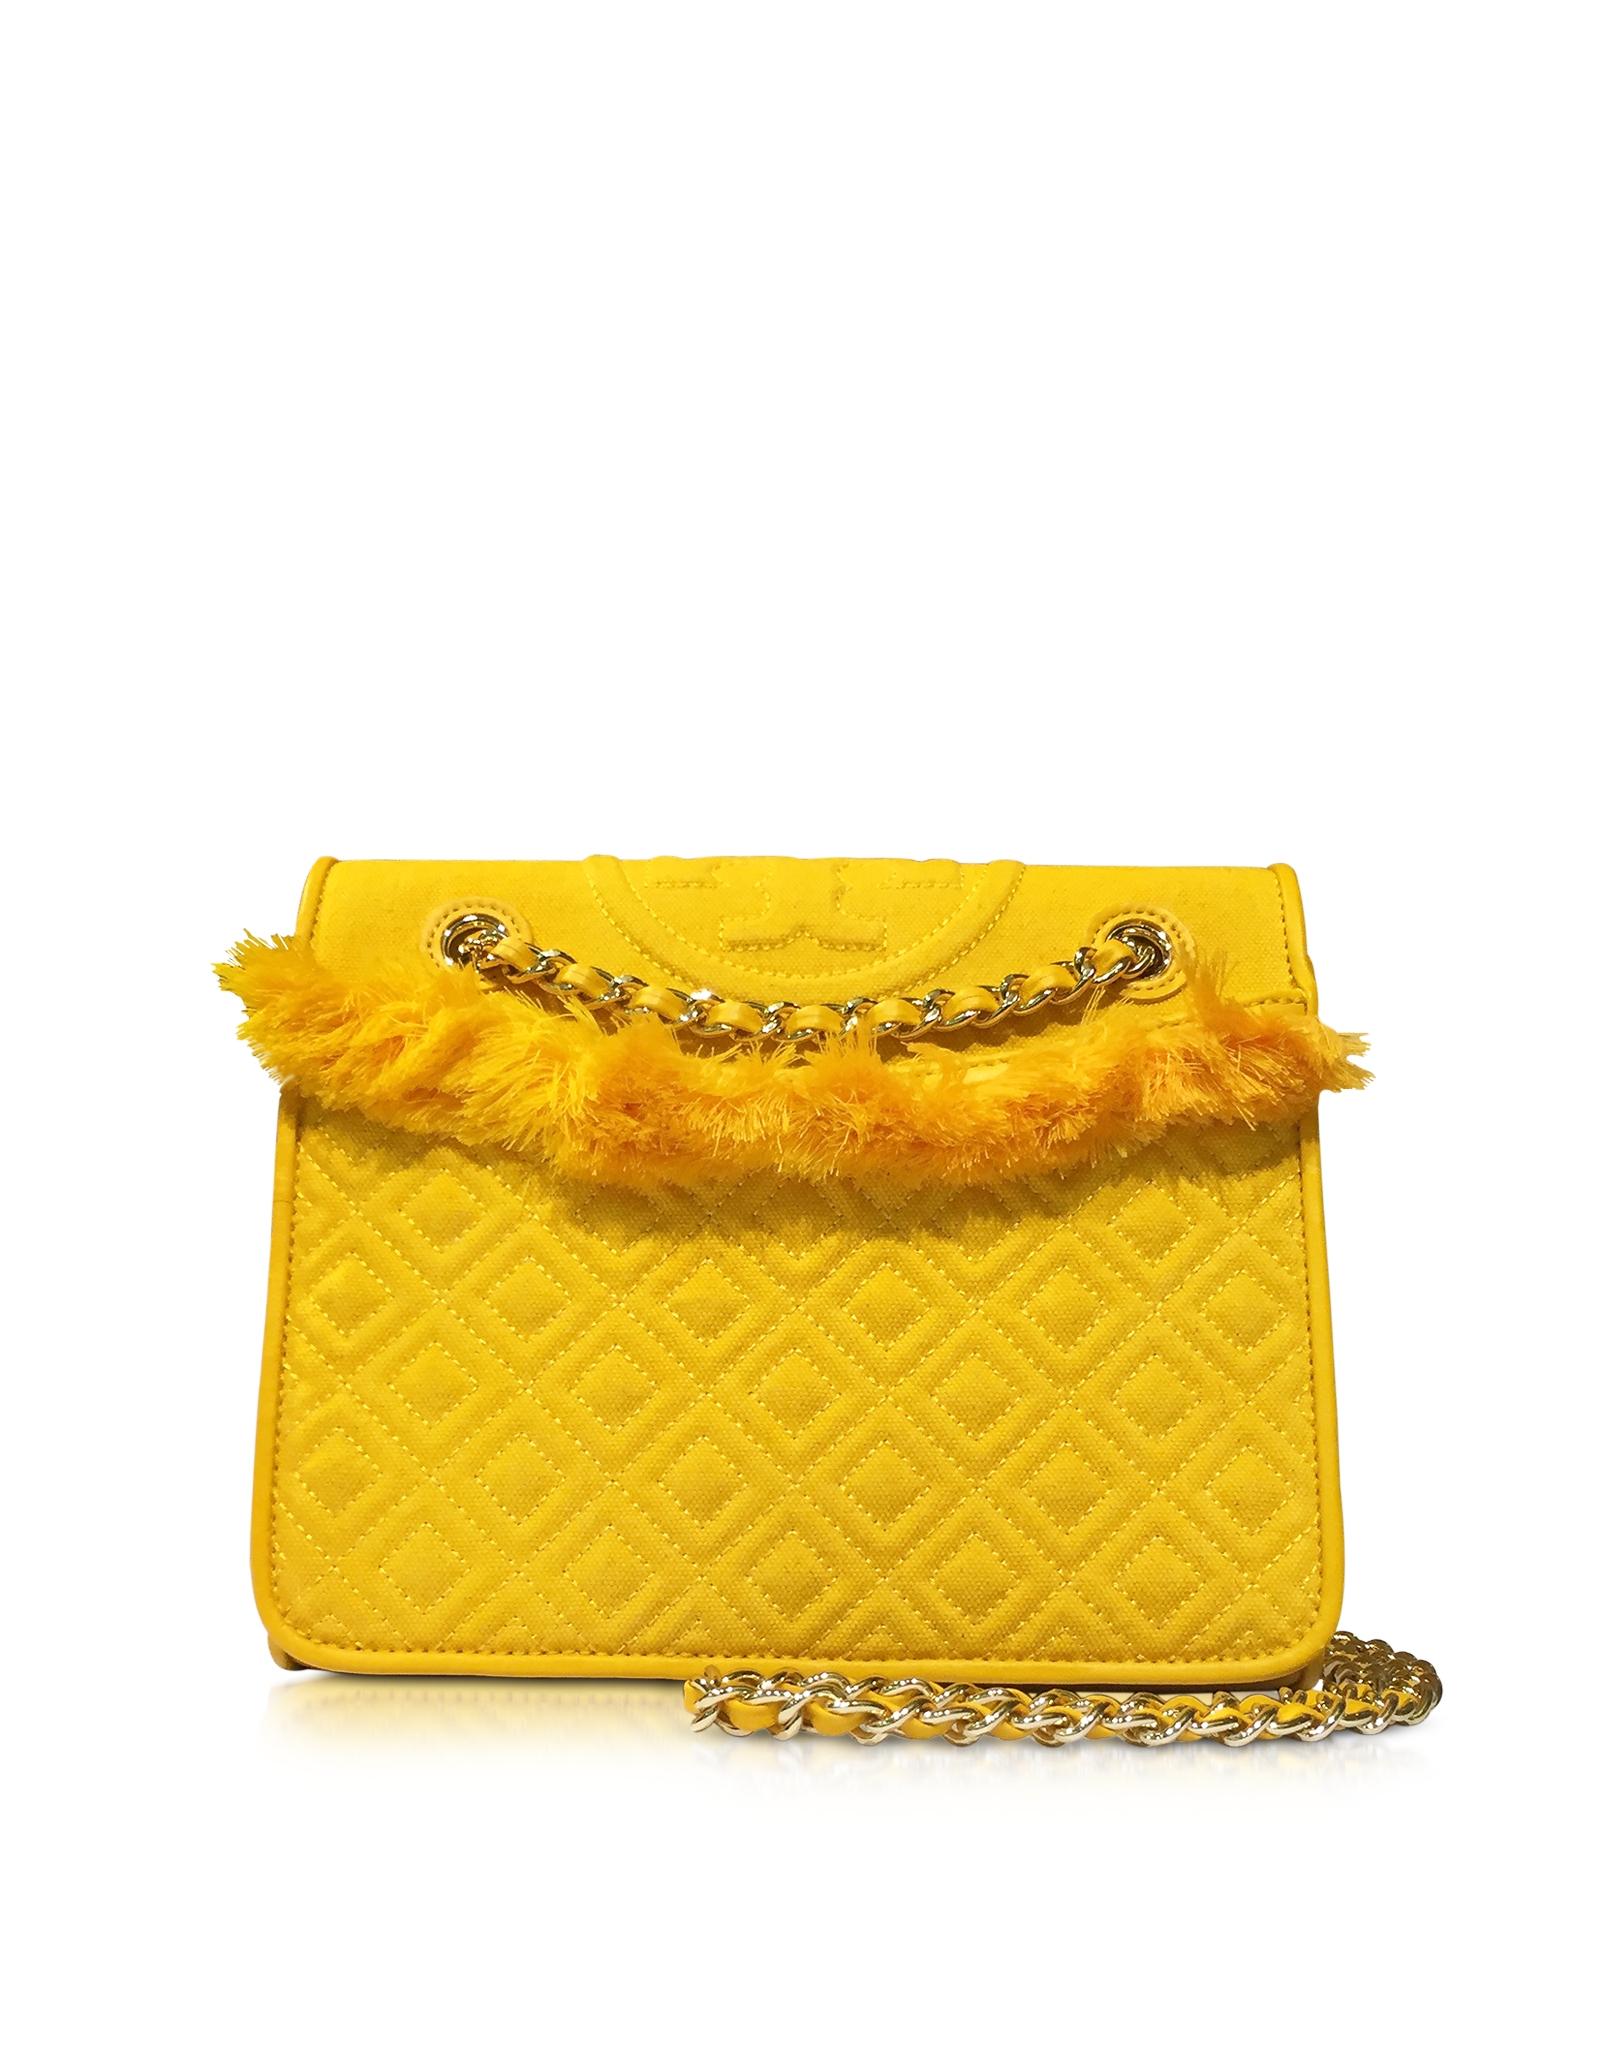 fff62236a98 Lyst - Tory Burch Fleming Cotton Medium Bag in Yellow